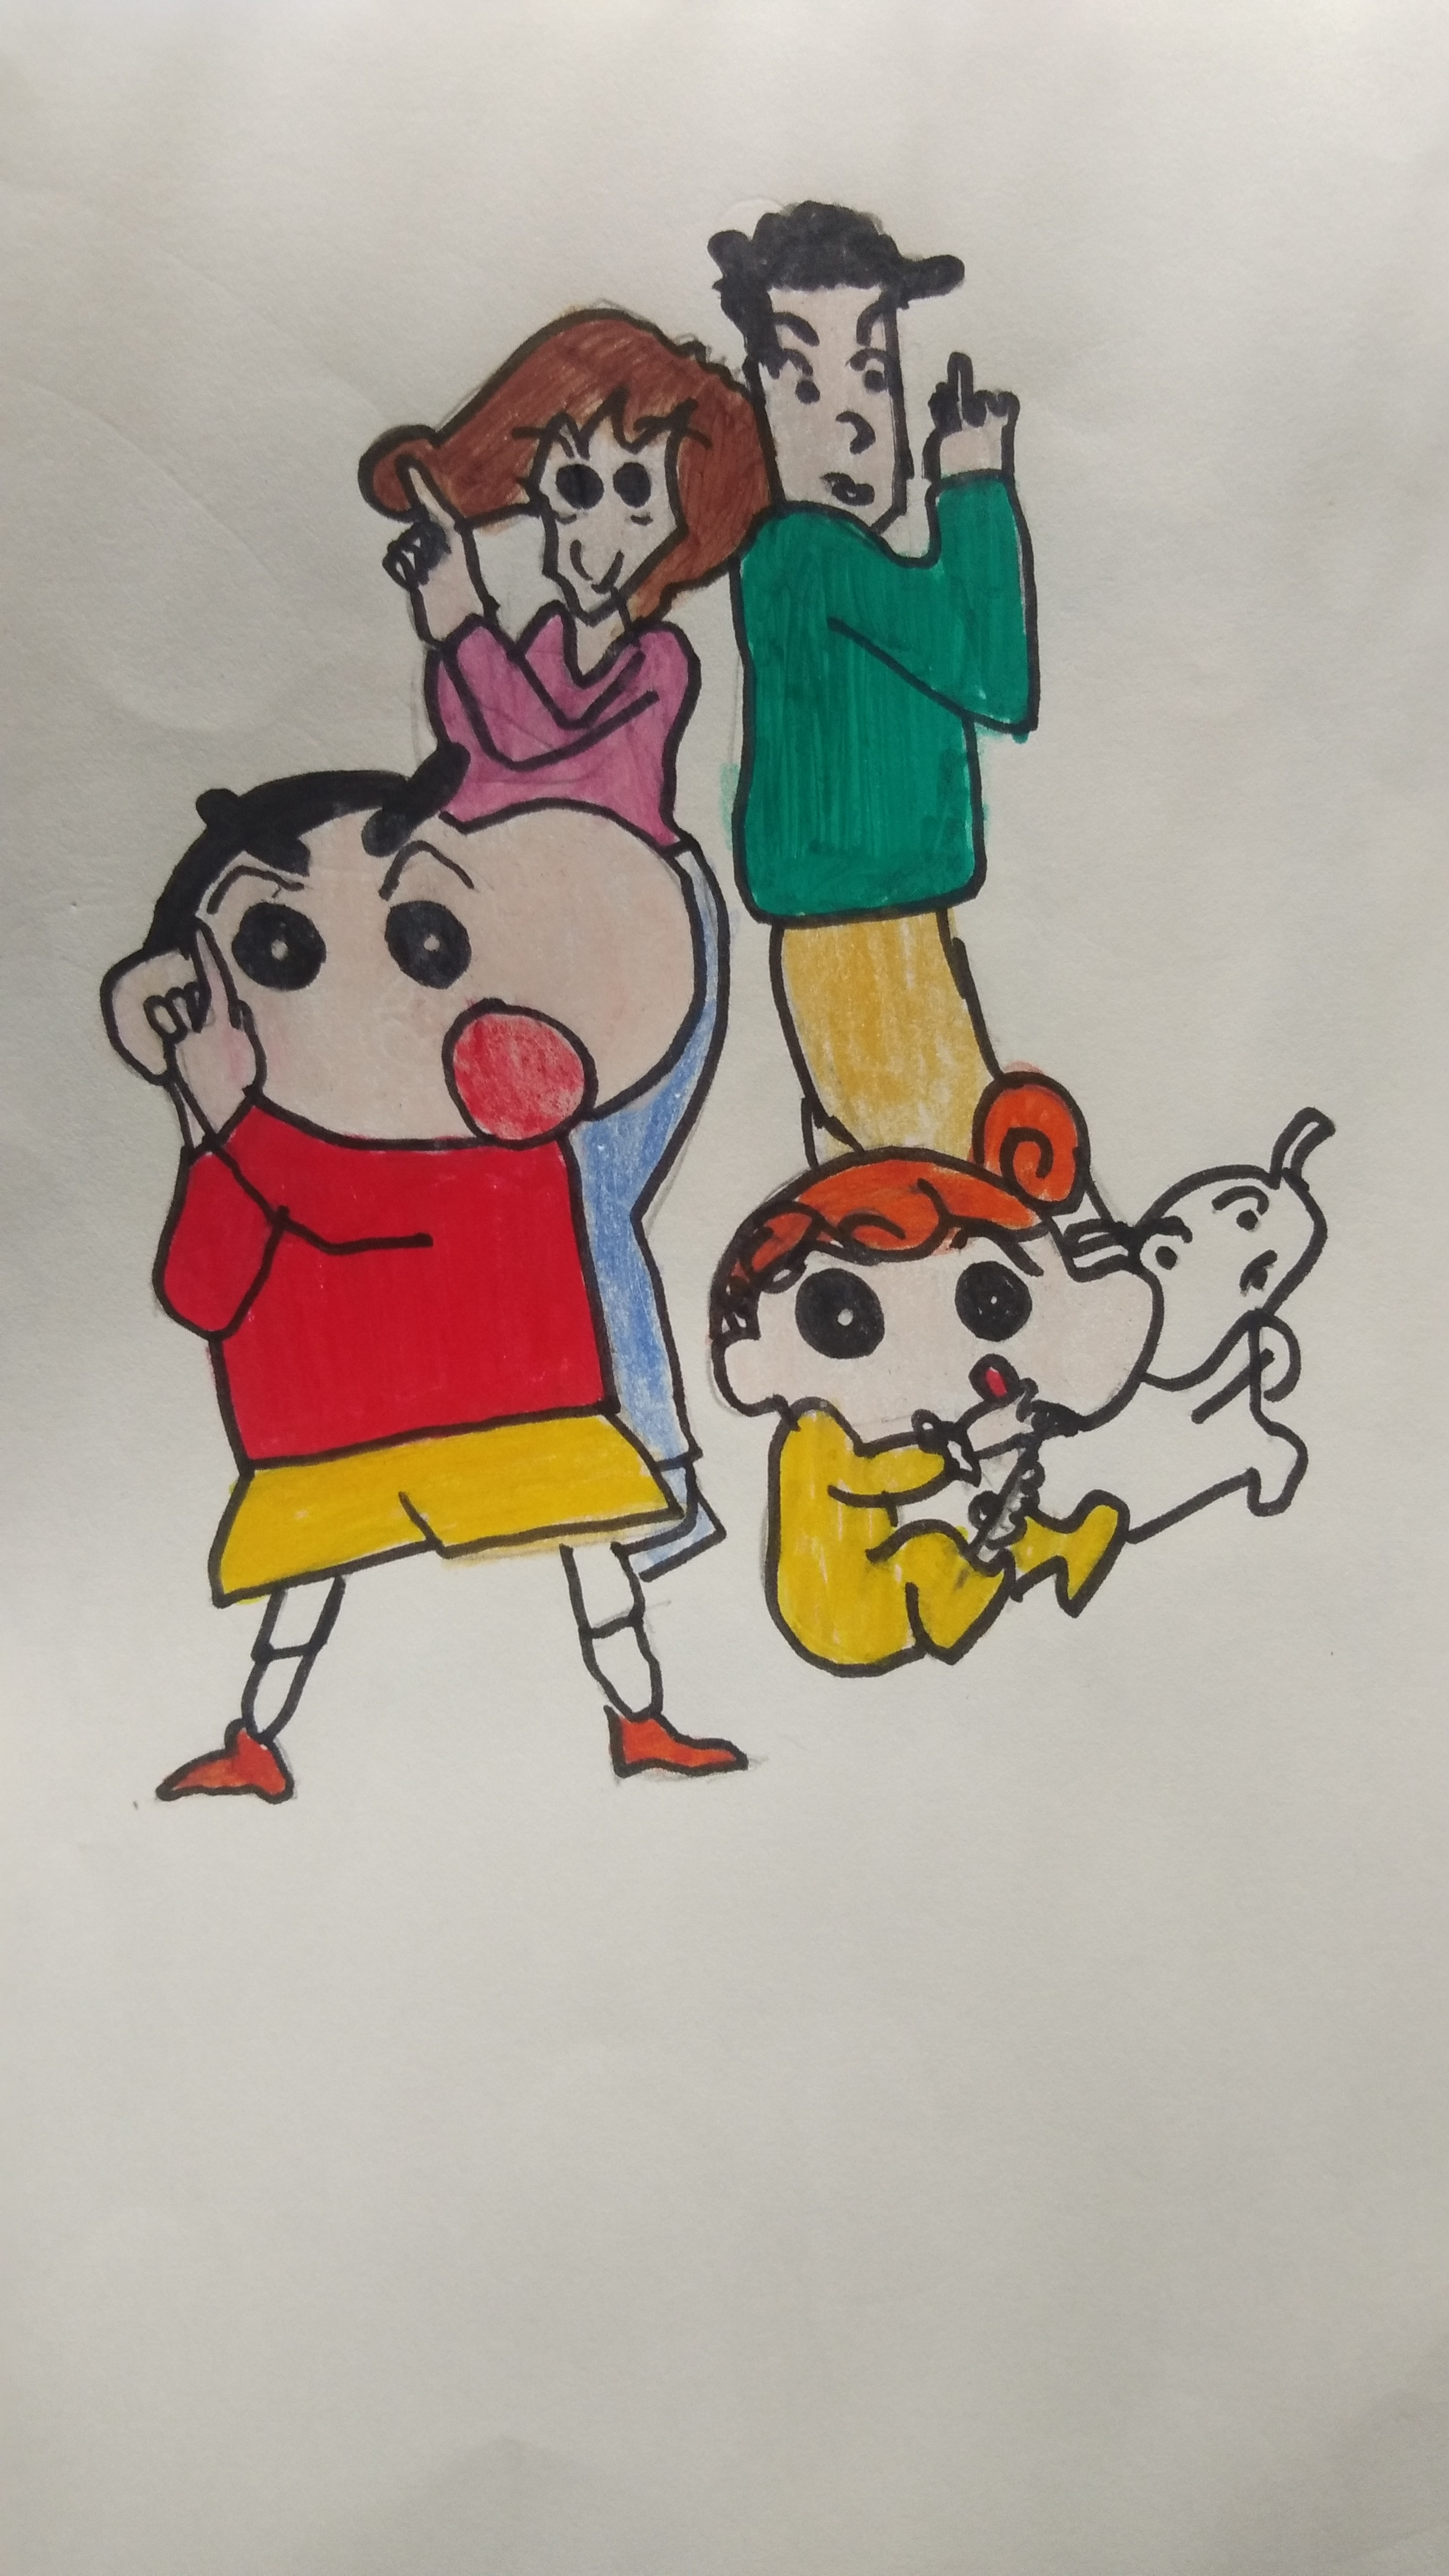 Shinchan's Sketch by Akshaya